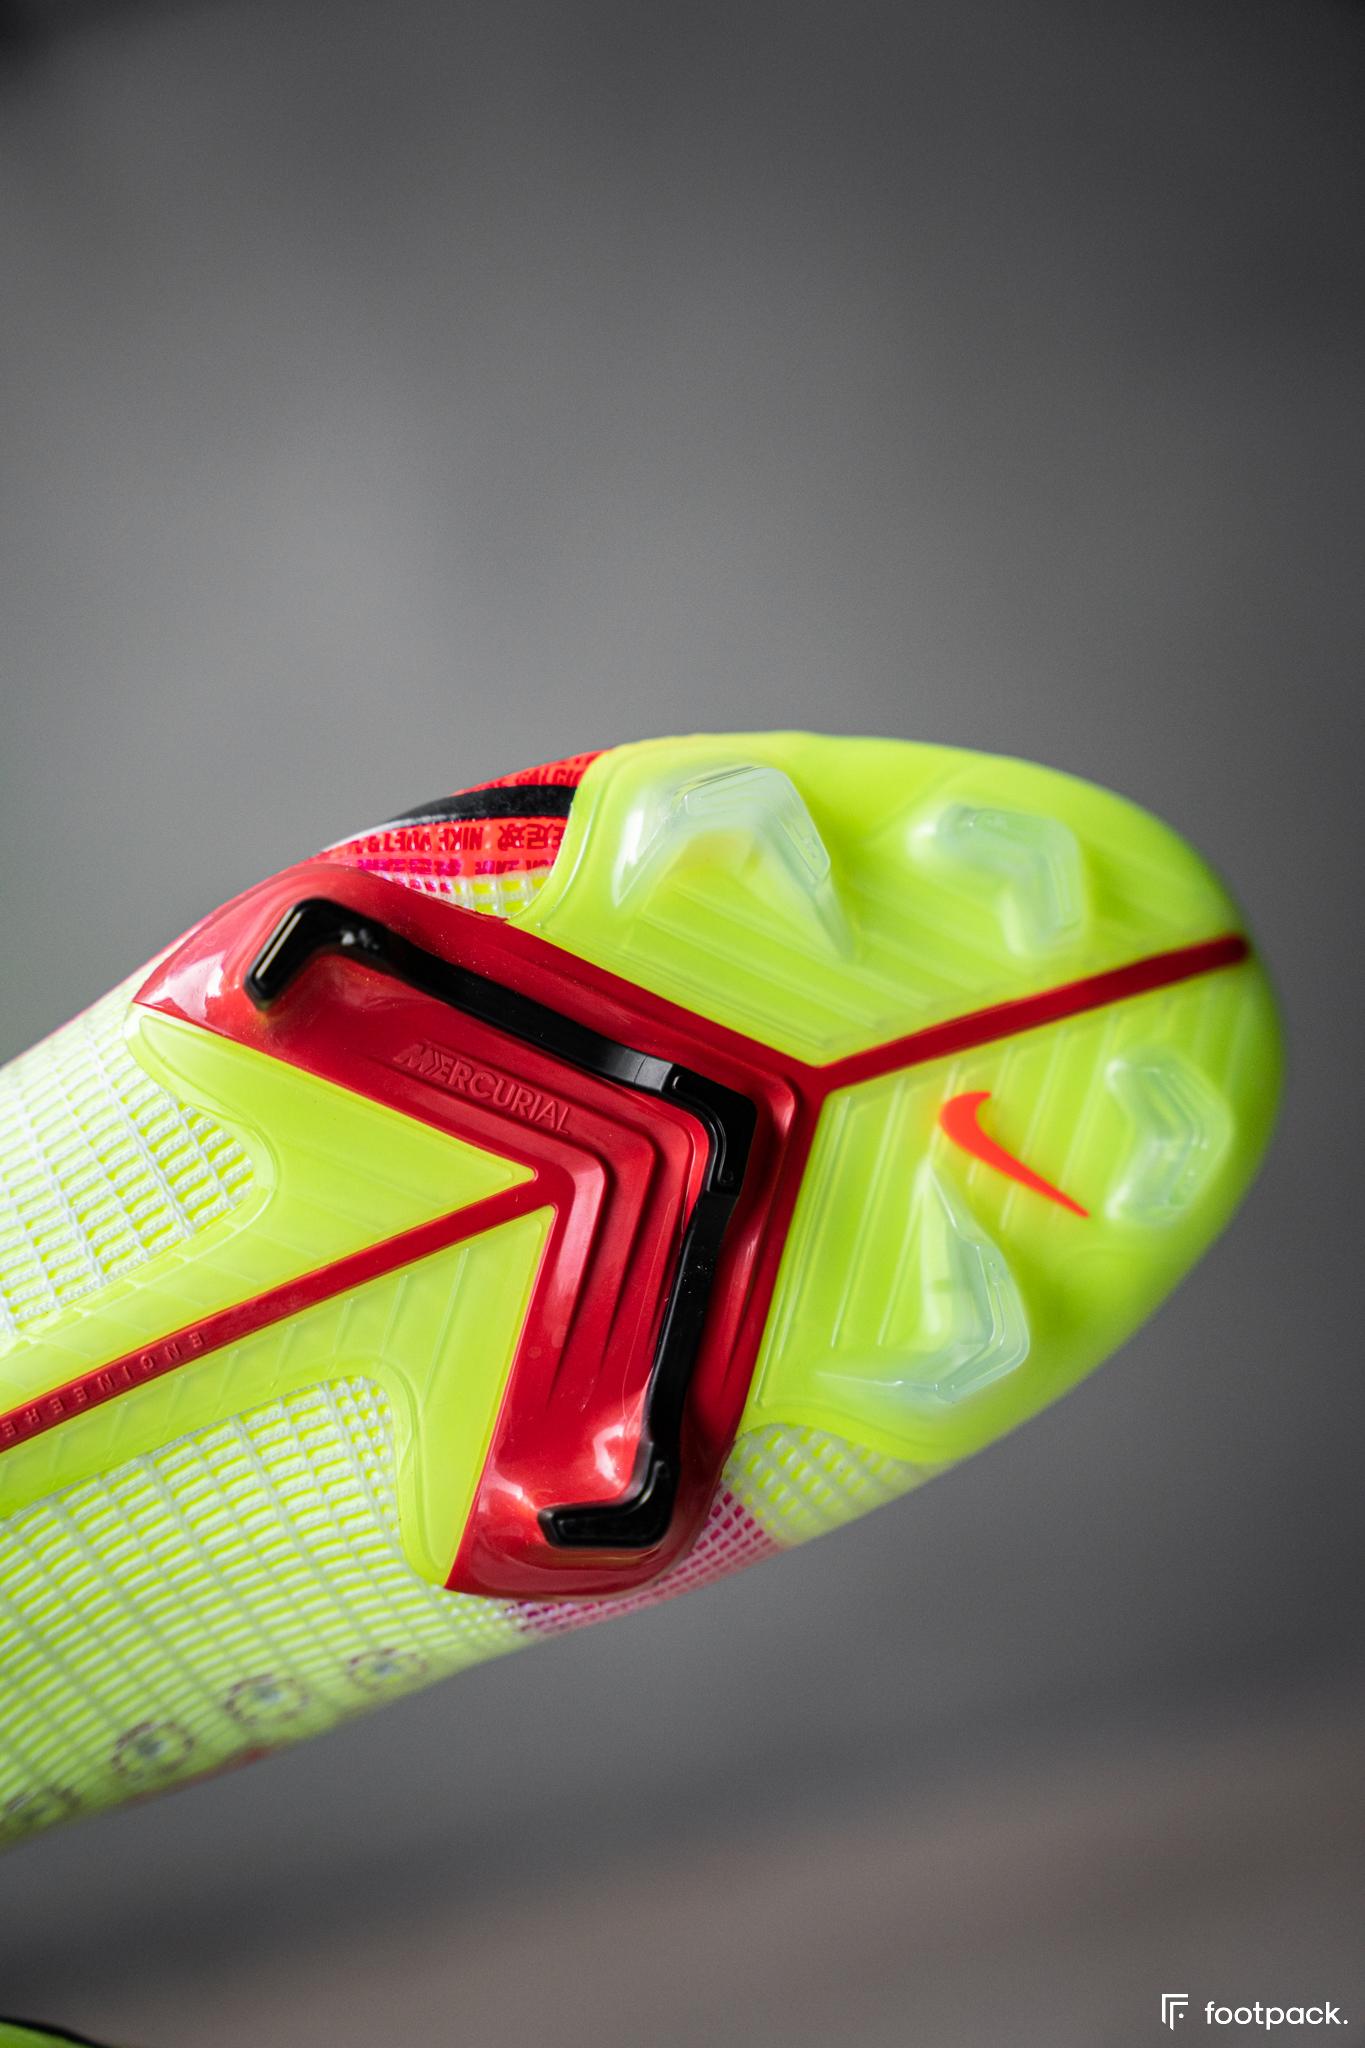 Nike Mercurial Vapor 14 Motivation Pack - footpack